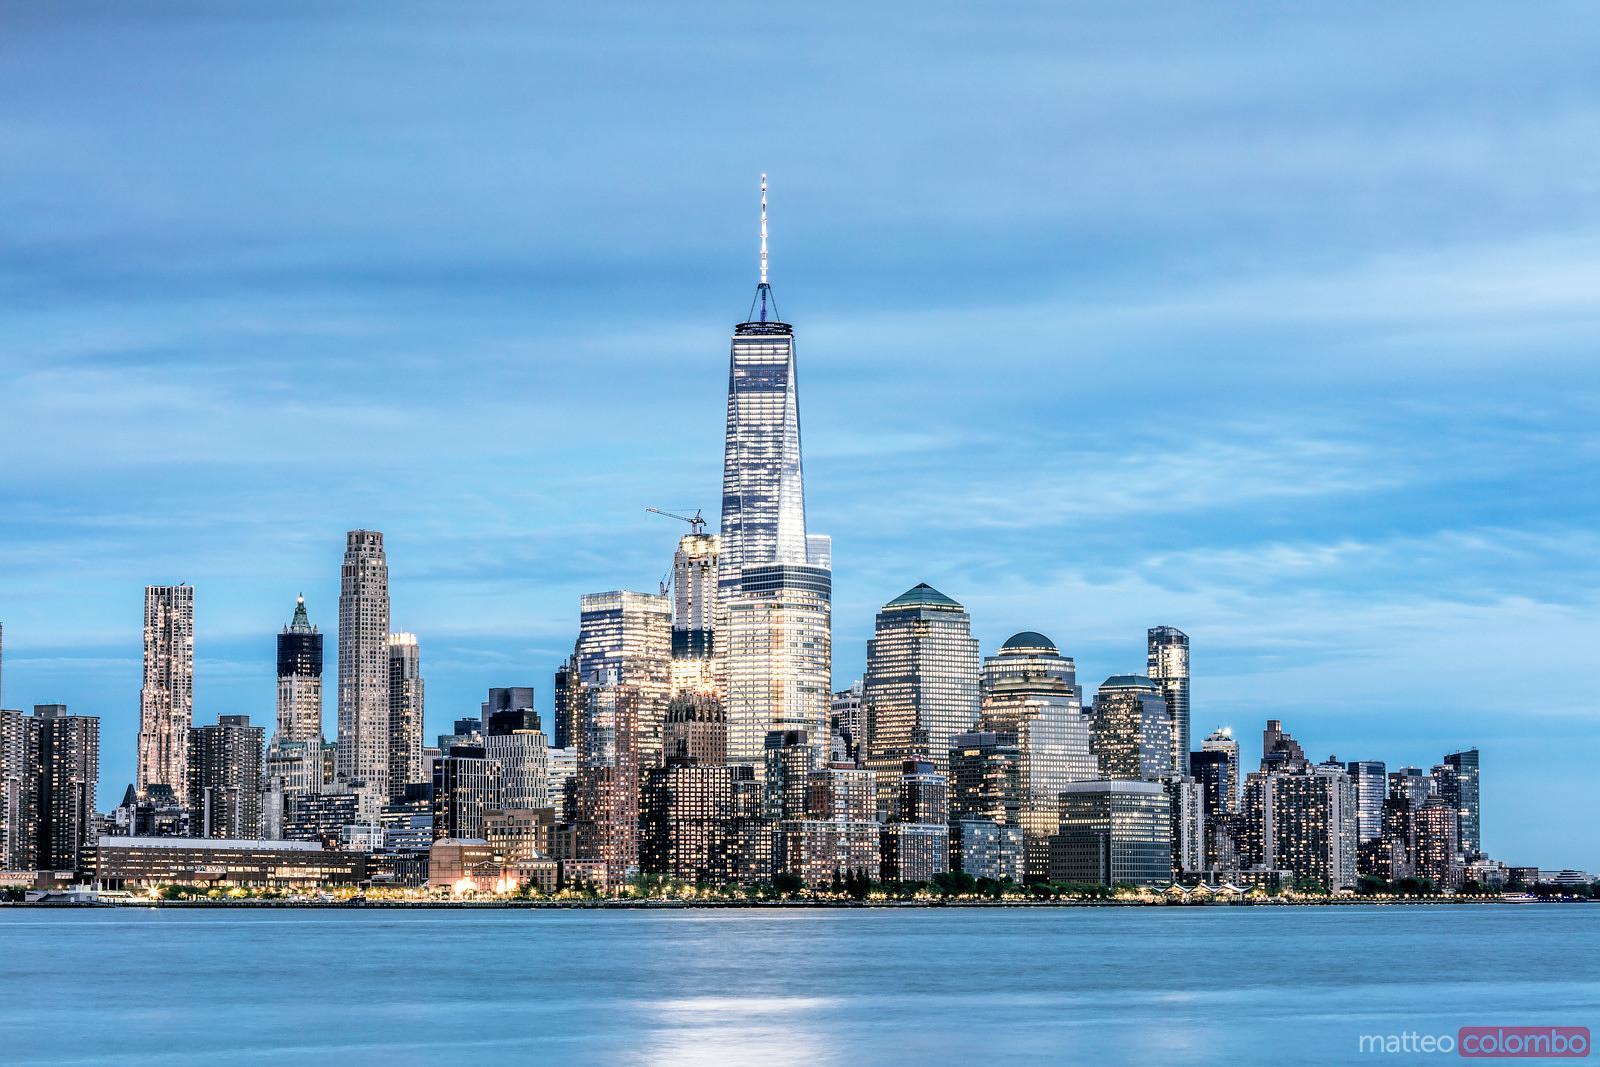 Matteo Colombo Travel Photography Lower Manhattan Skyline And